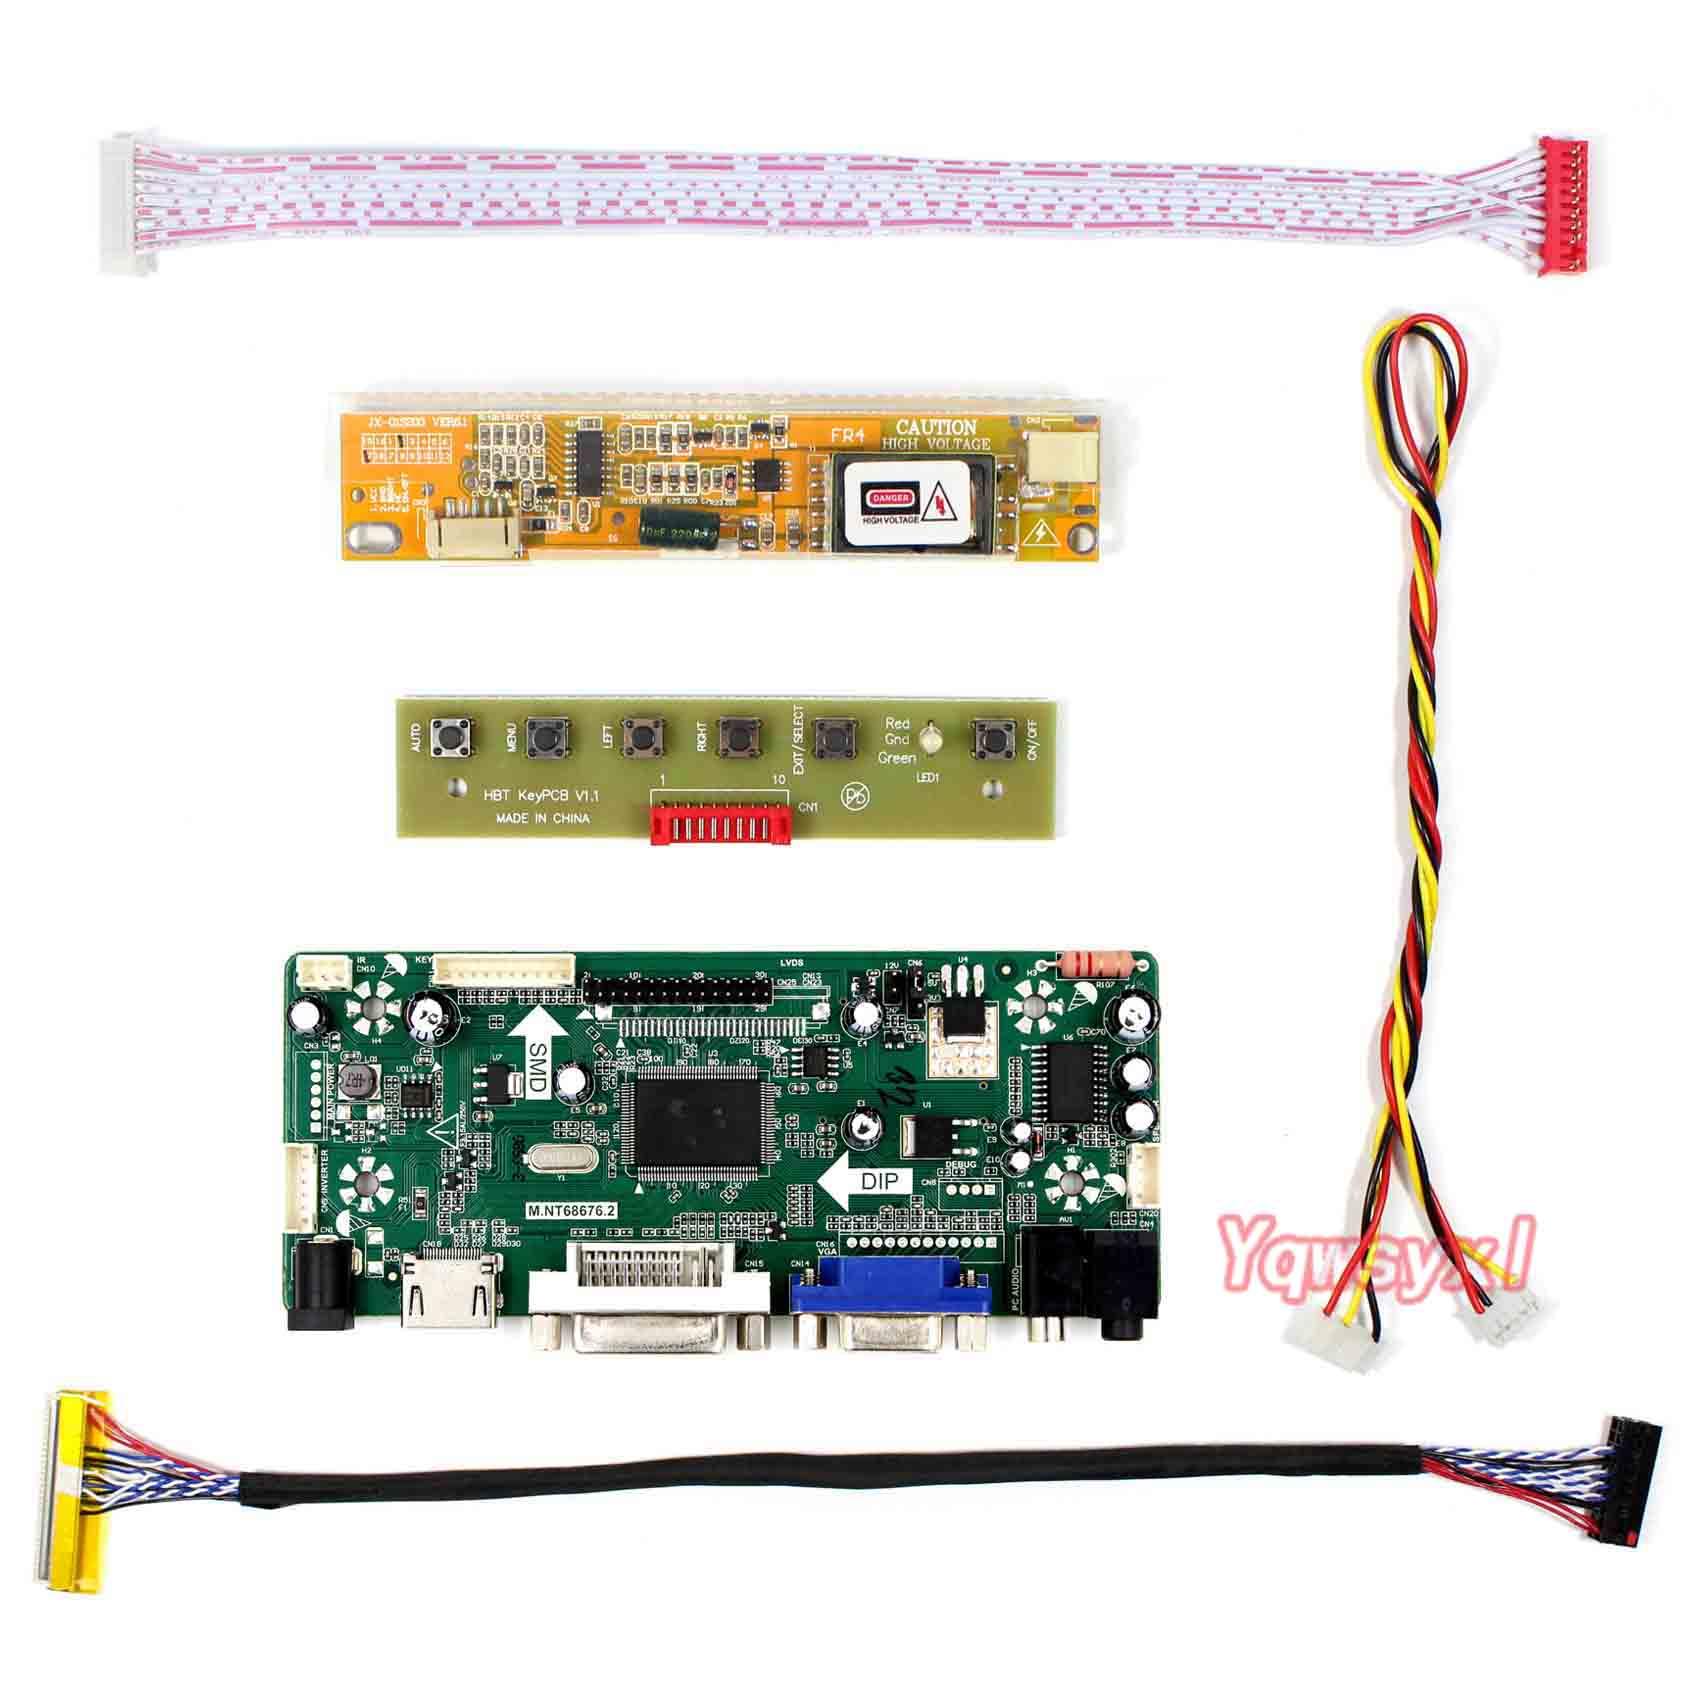 Yqwsyxl Control Board Monitor Kit for LTN150PG-L03  HDMI + DVI + VGA LCD LED screen Controller Board Driver